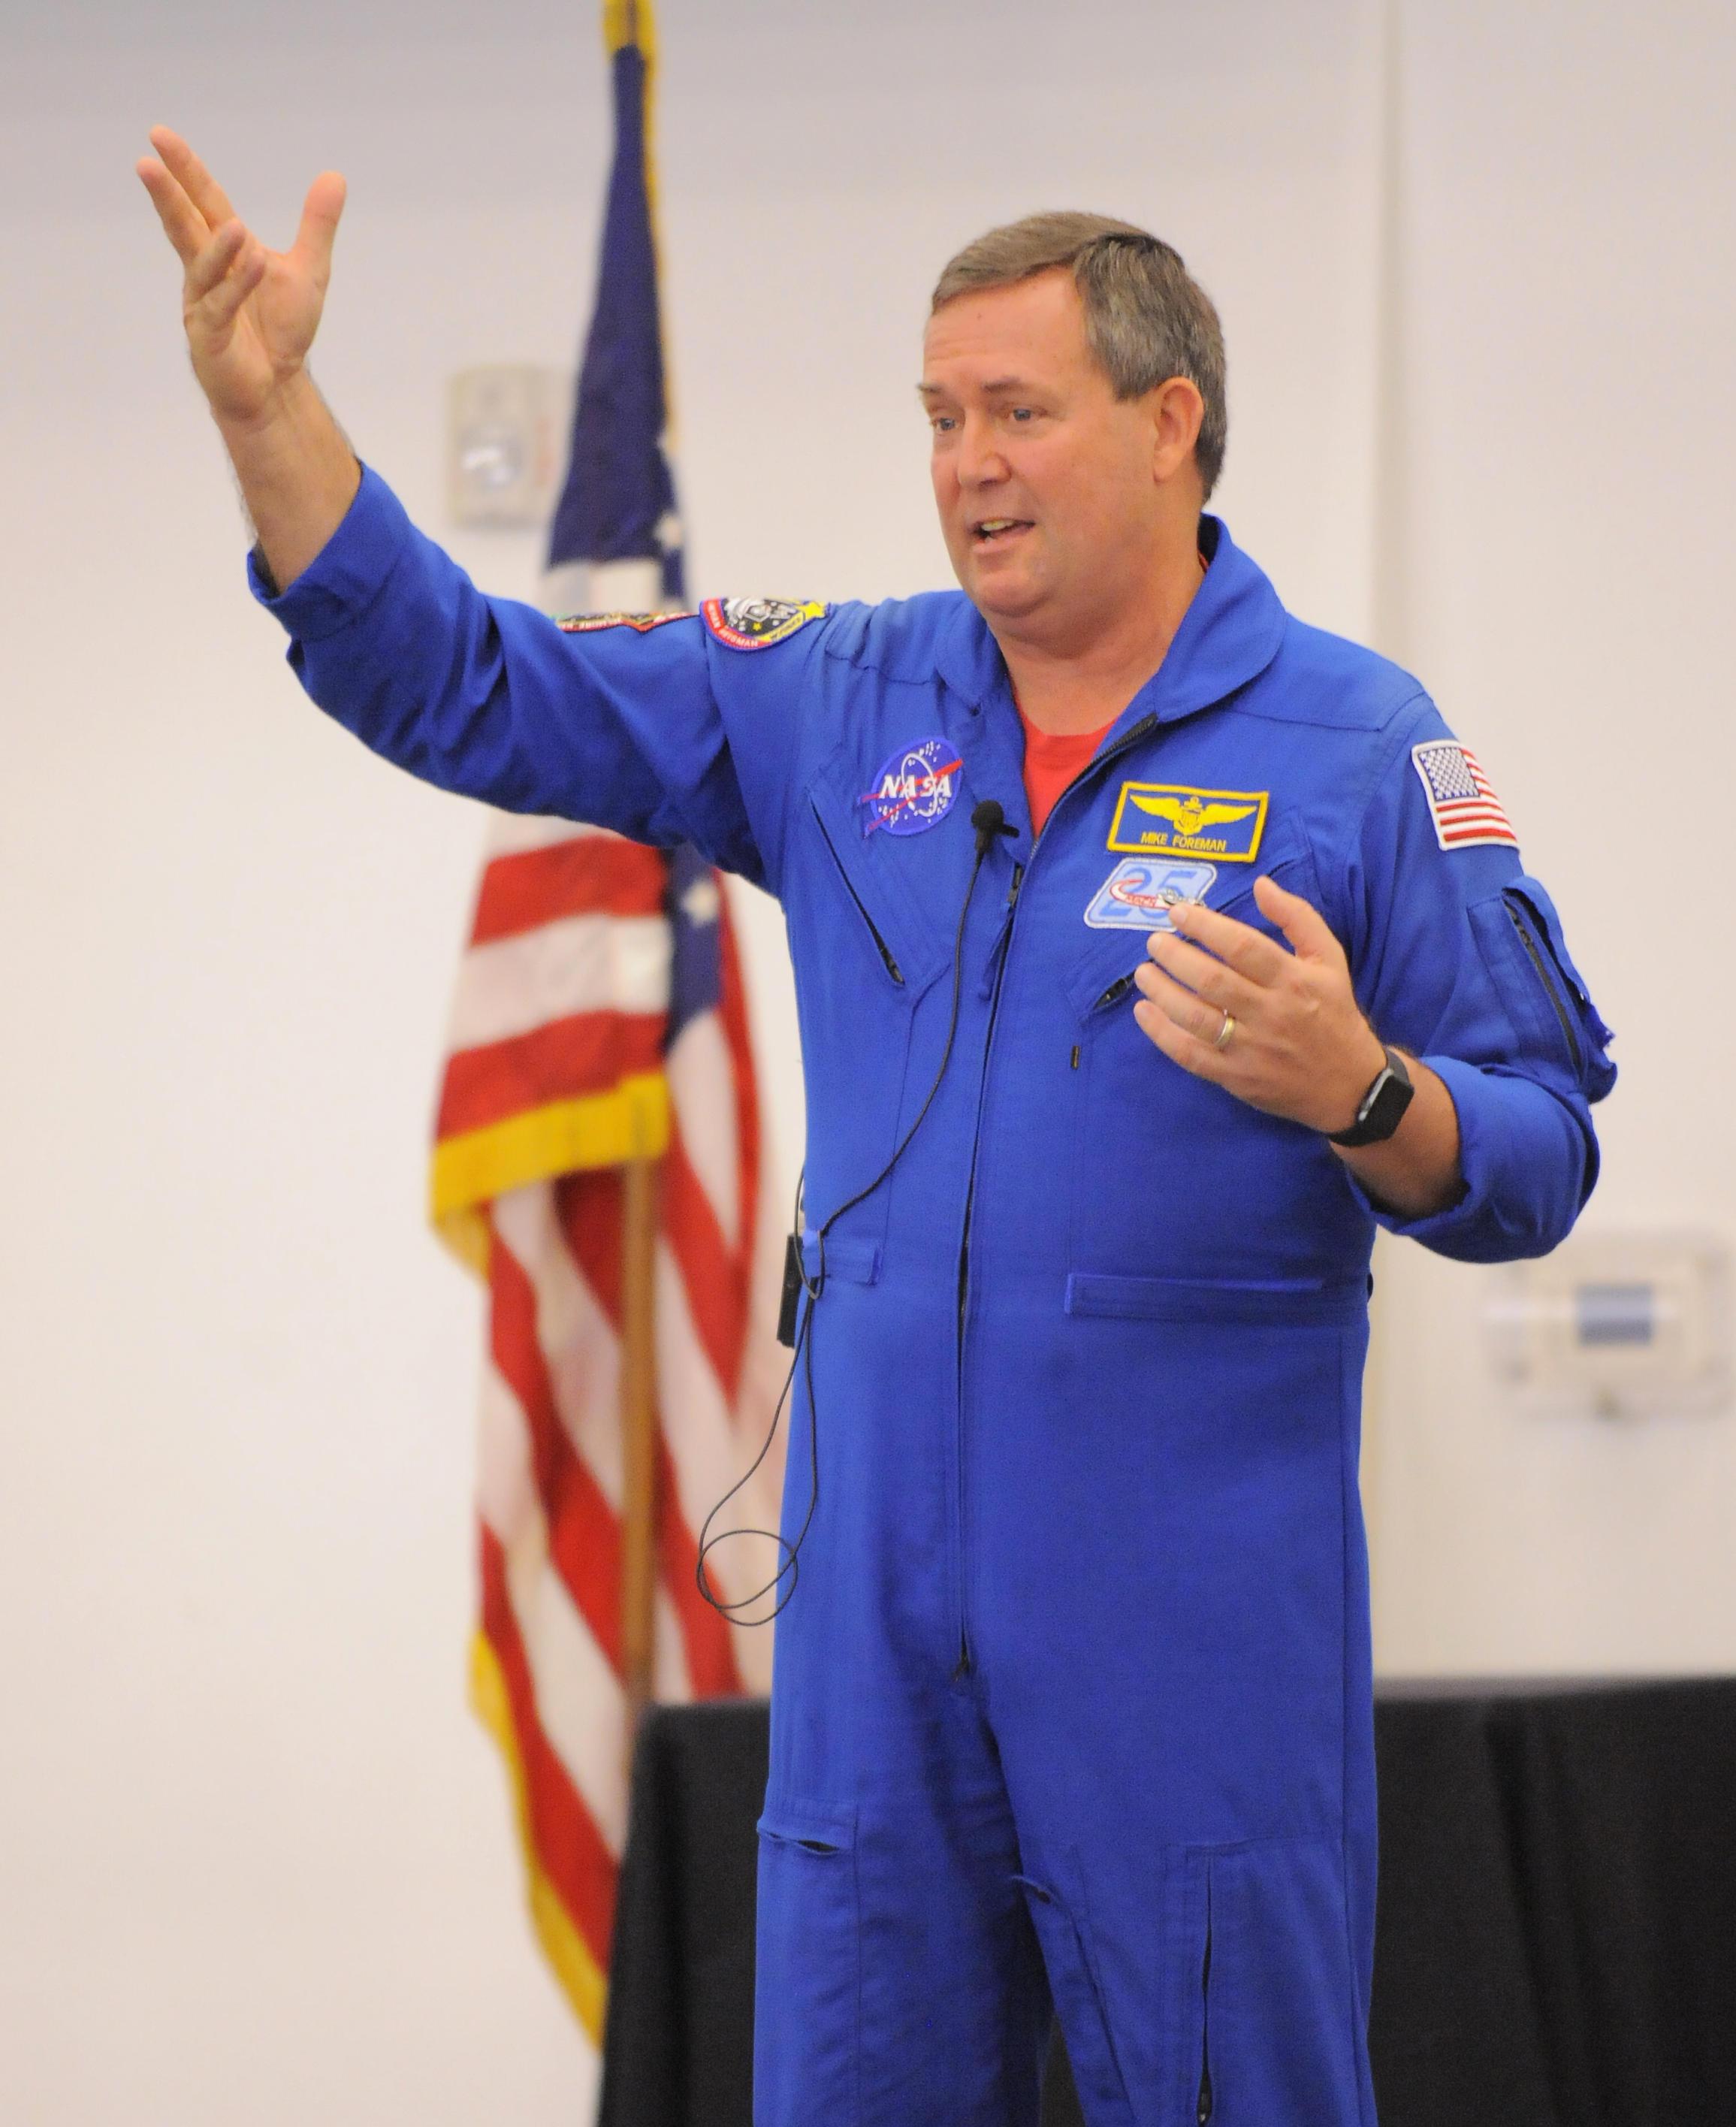 michael foreman astronaut - photo #10